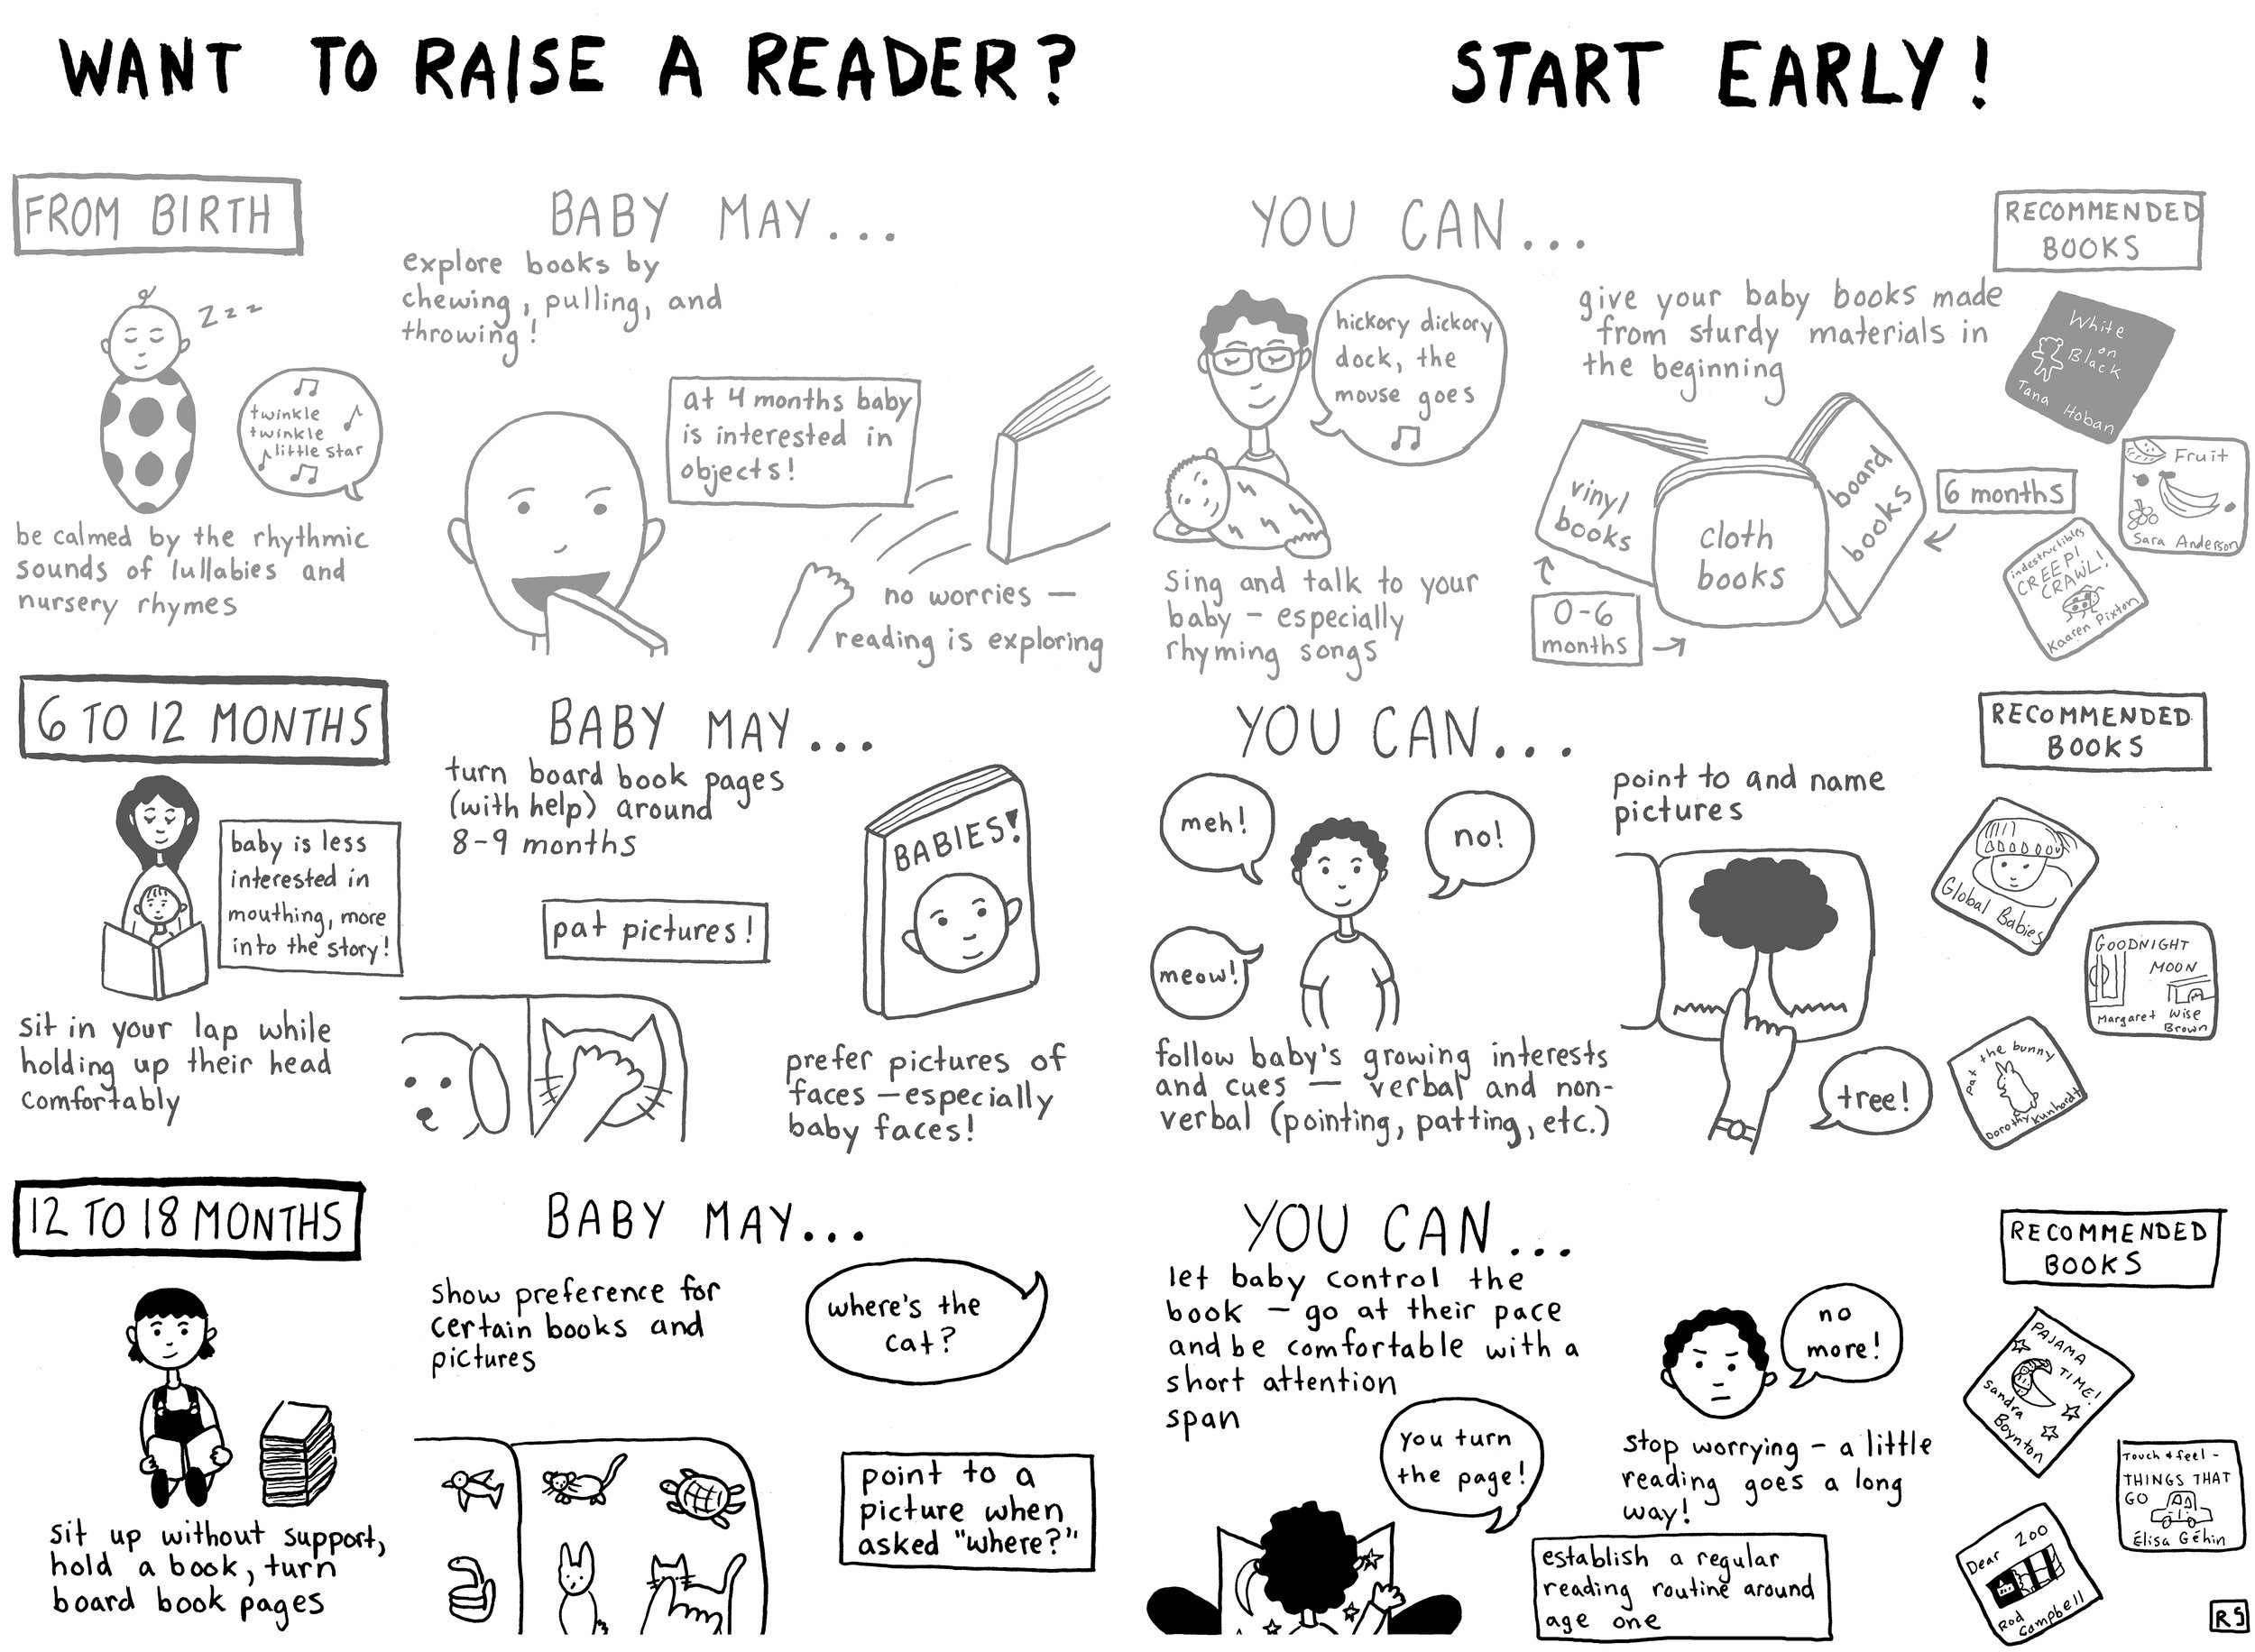 raiseareader-full page.jpg